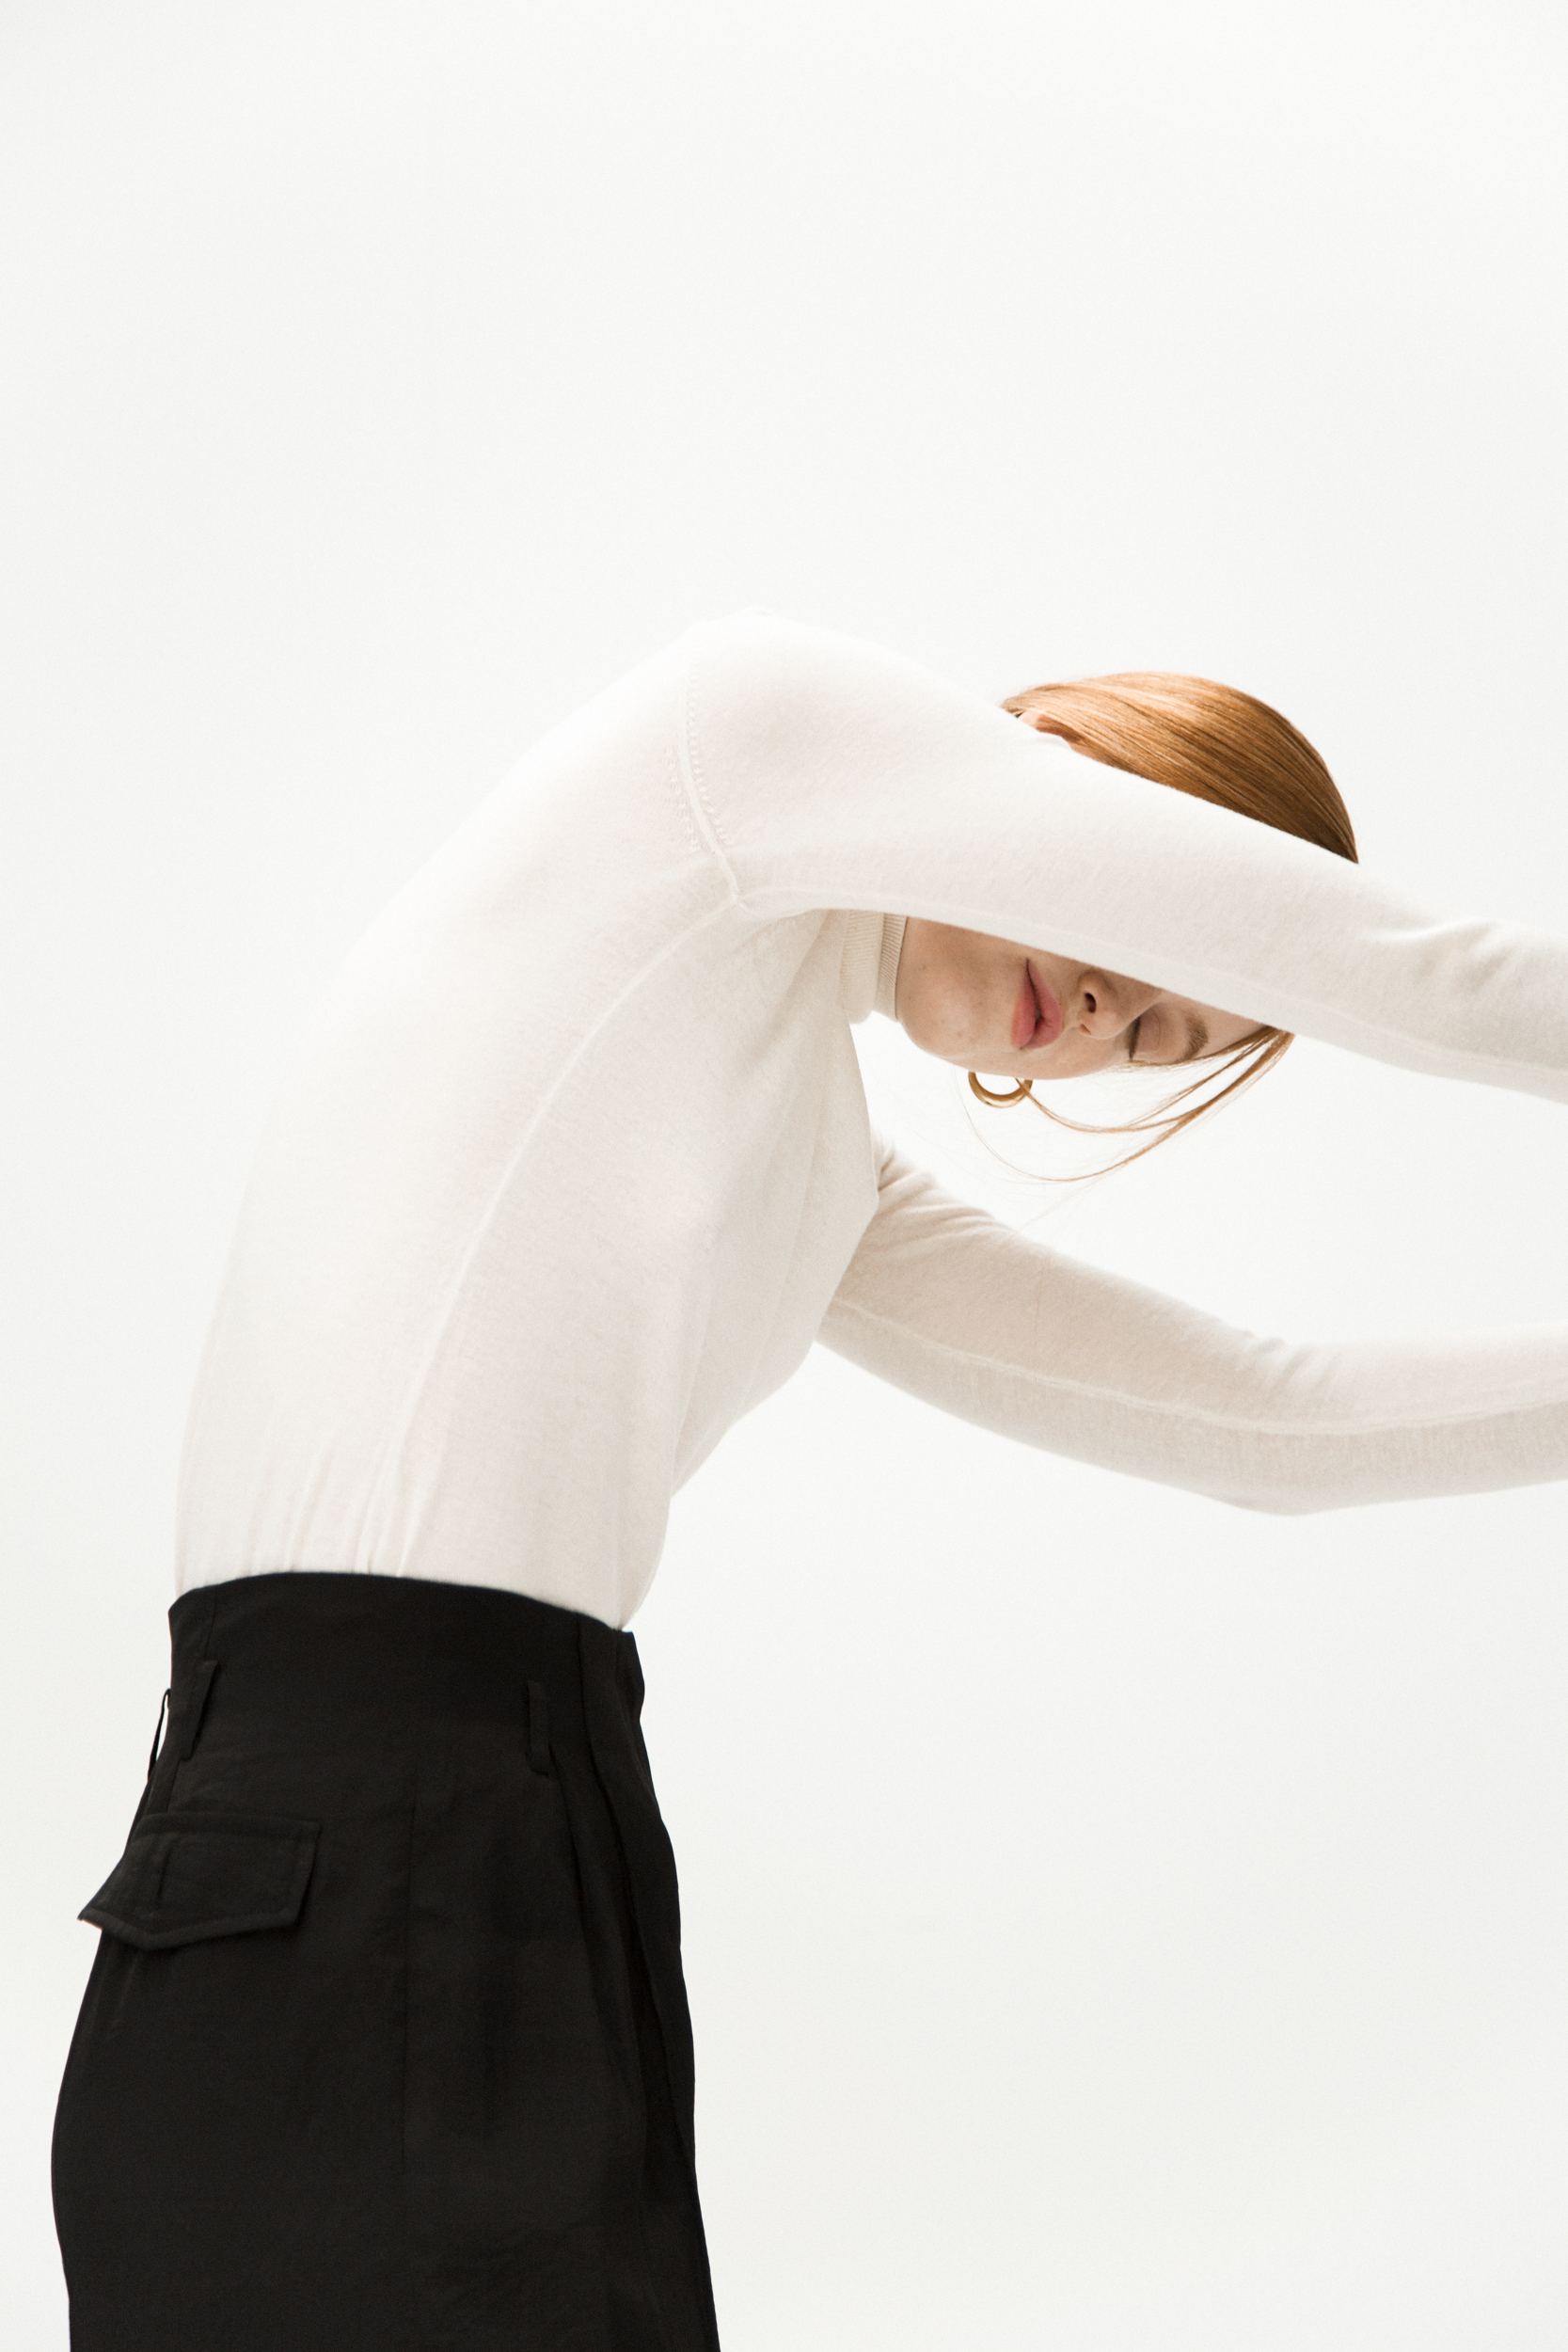 Massimo Dutti jumper / Rejina Pyo trousers